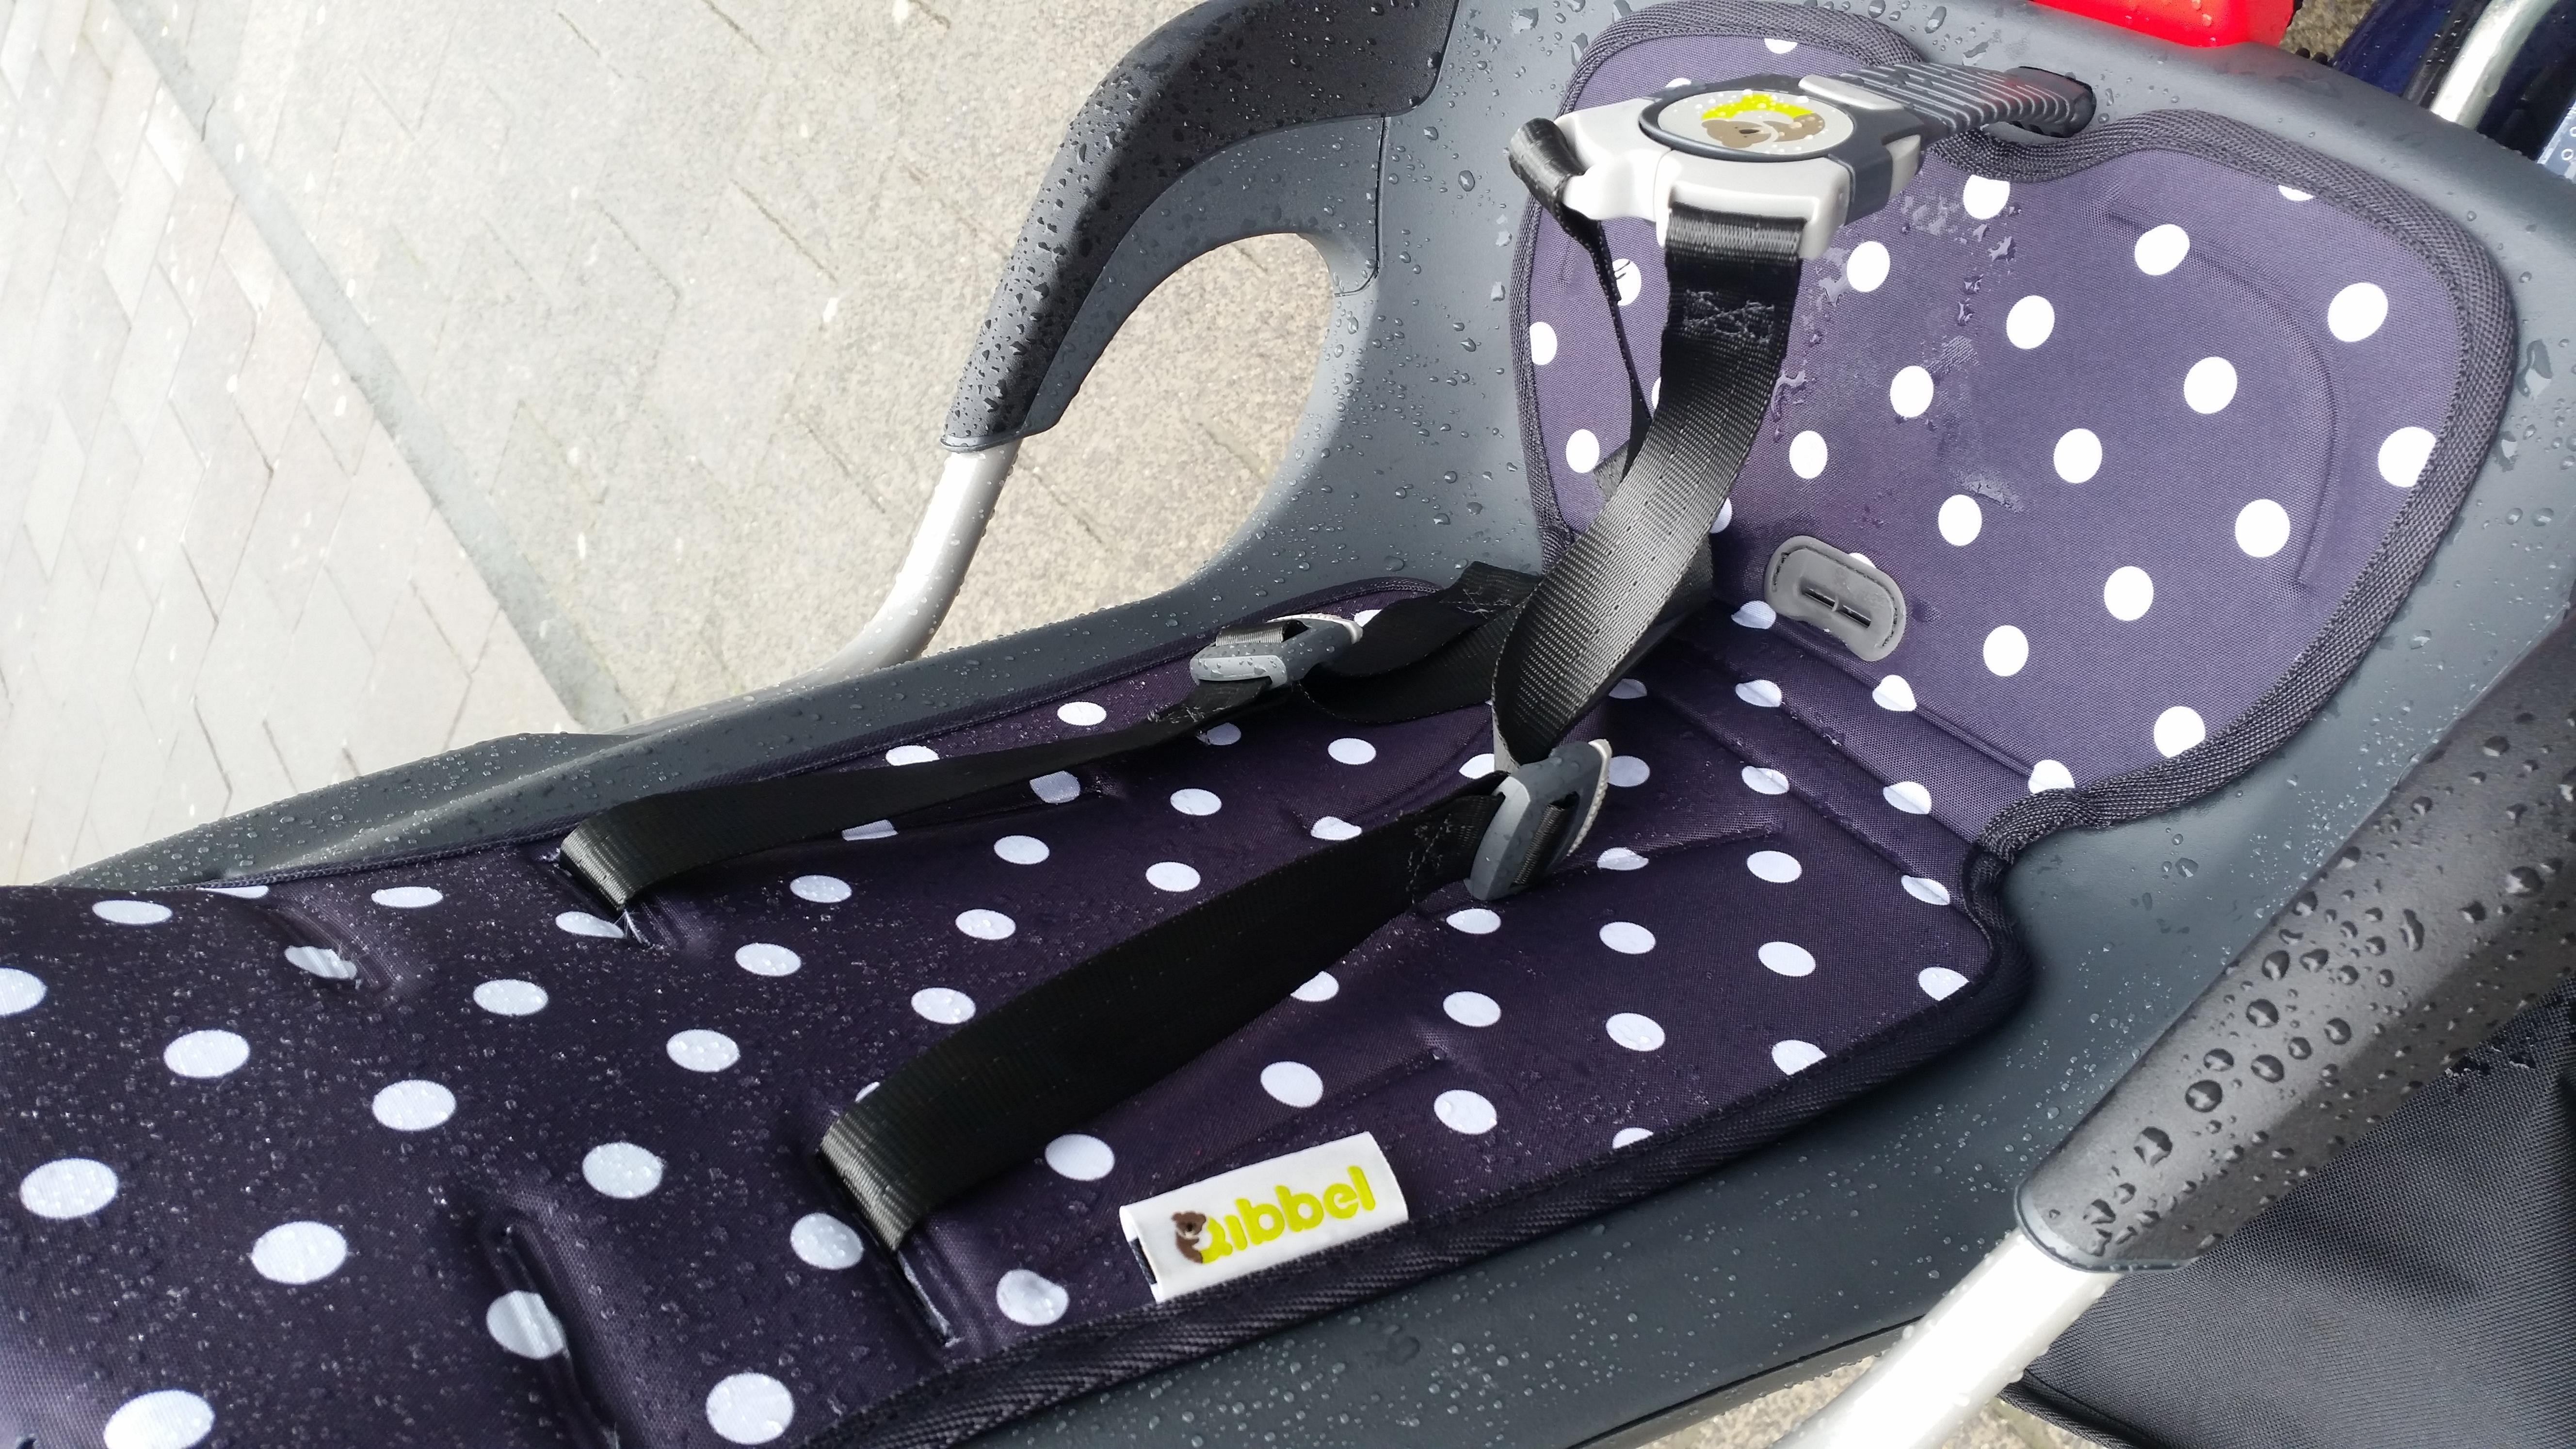 7-16-qibbel-fietszitje-fietsen-baby-kind-fietsstoeltje-achter-ligstand-liggen-slapen-regen-handig-bekleding-mooi-stevig-montage-monteren-nanny-moeder-amsterdam-regent